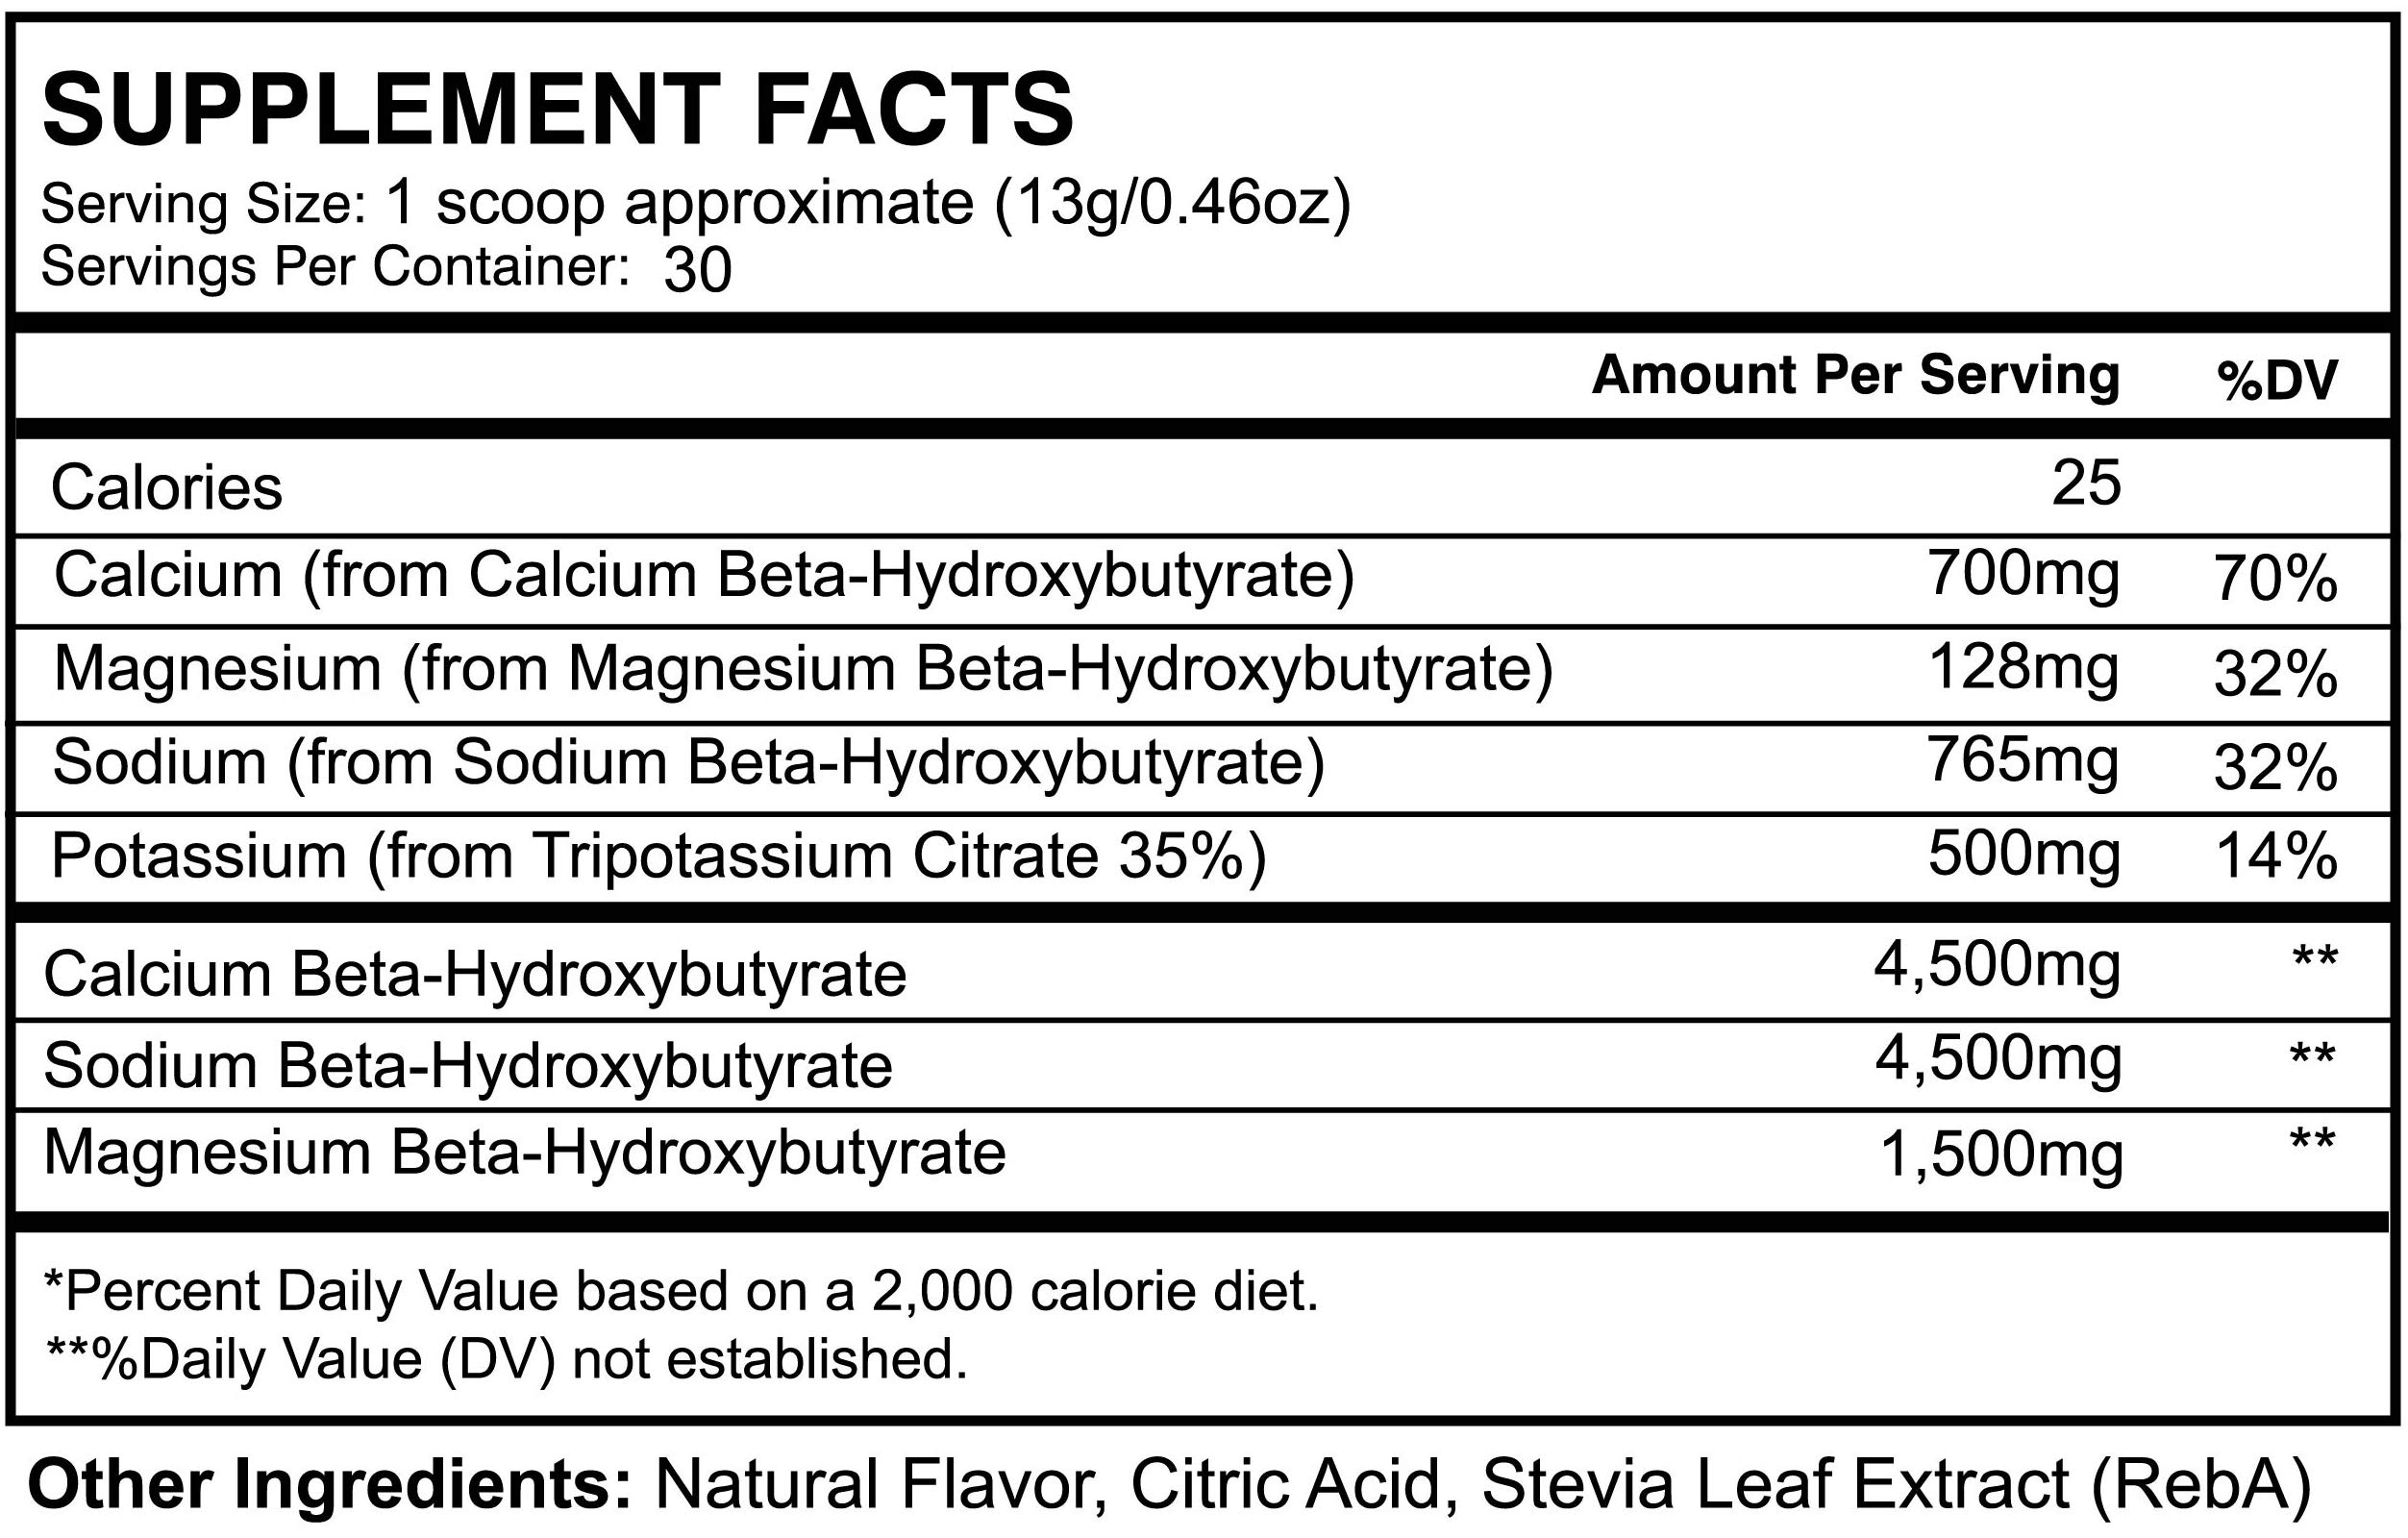 Ketosene XLTM 30 Servings Extra Large Exogenous Ketones Powder - Kickstart Ketosis Within 1-Hour with a Pure Blend of Calcium and Magnesium Ketone BHB Salts (KetoVantage® BHB) - Perfect Keto Diet Bulk by VitaMonk (Image #6)